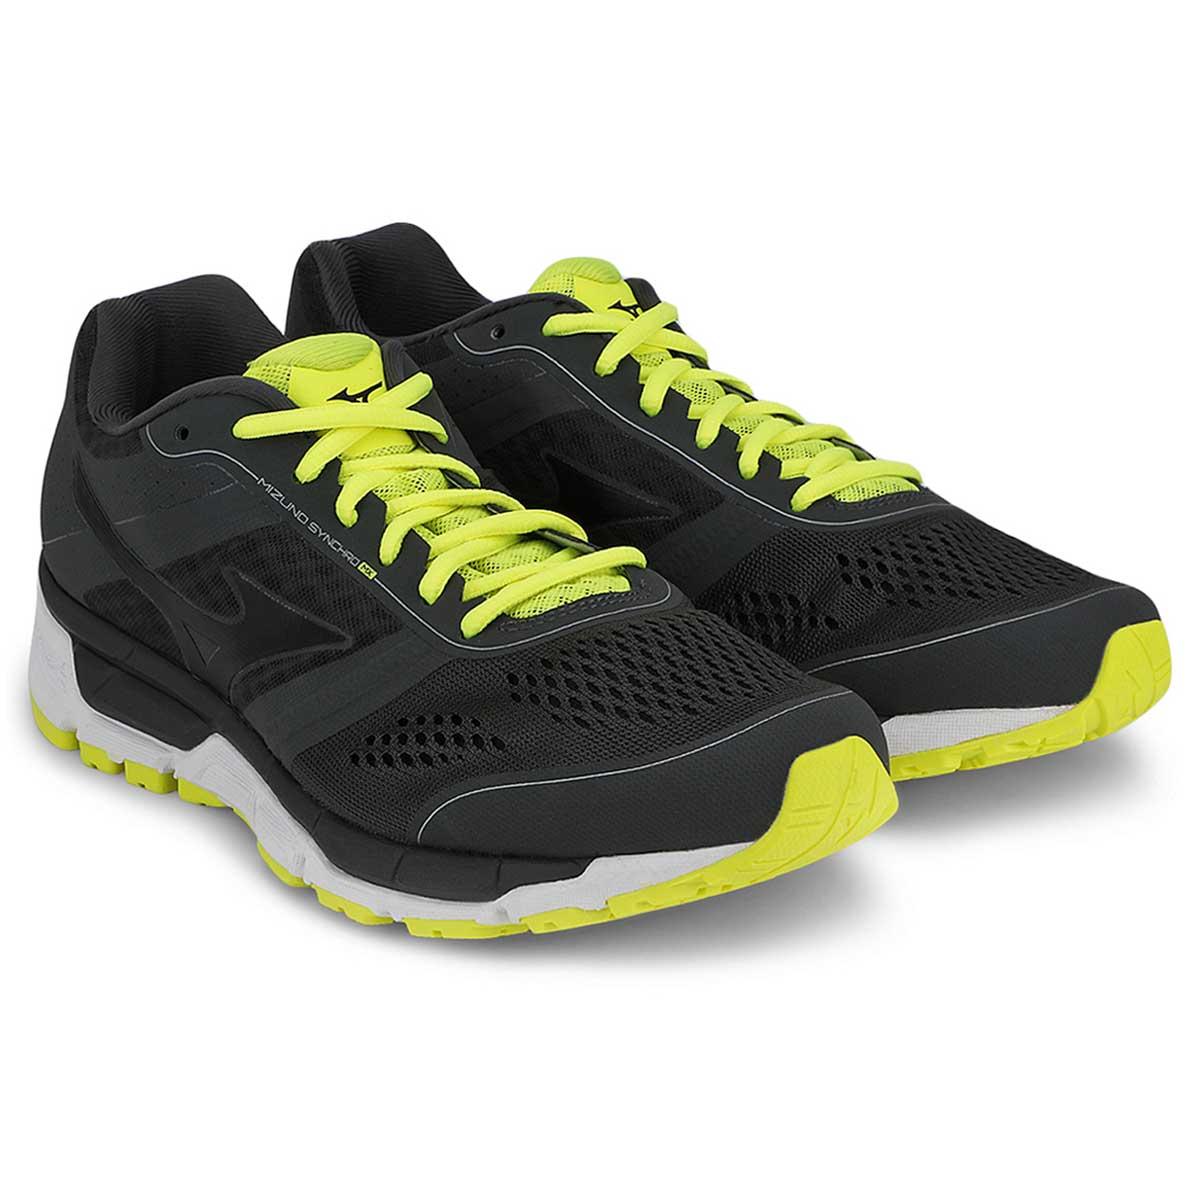 low priced f0f05 1c247 Mizuno Synchro MX Running Shoes (Grey/Black/Yellow)